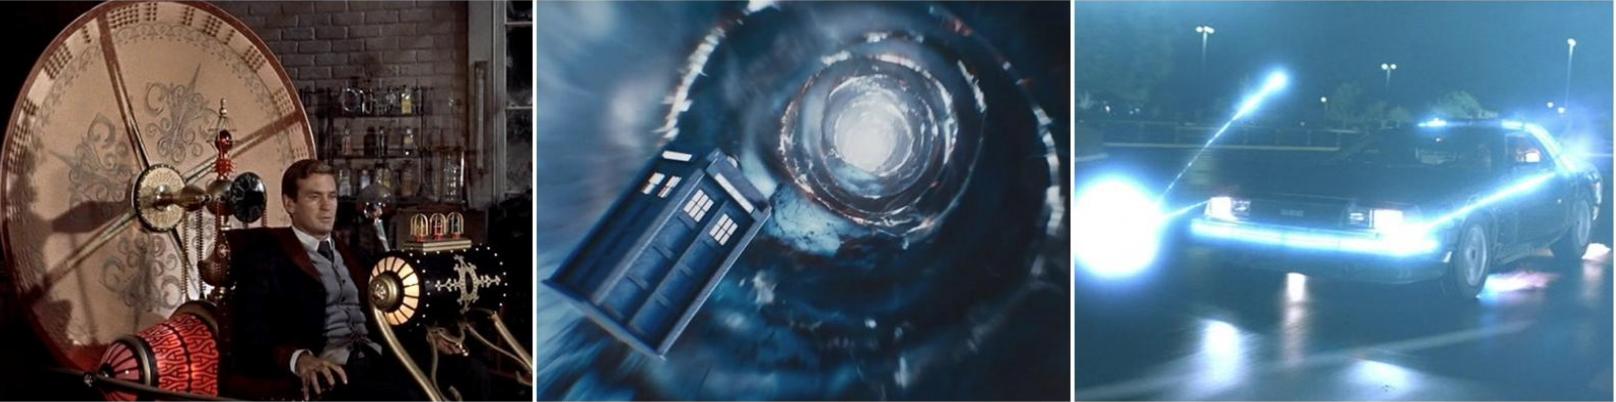 Credit: Warner Bros                        Credit: BBC Worldwide                    Credit: Universal Studios